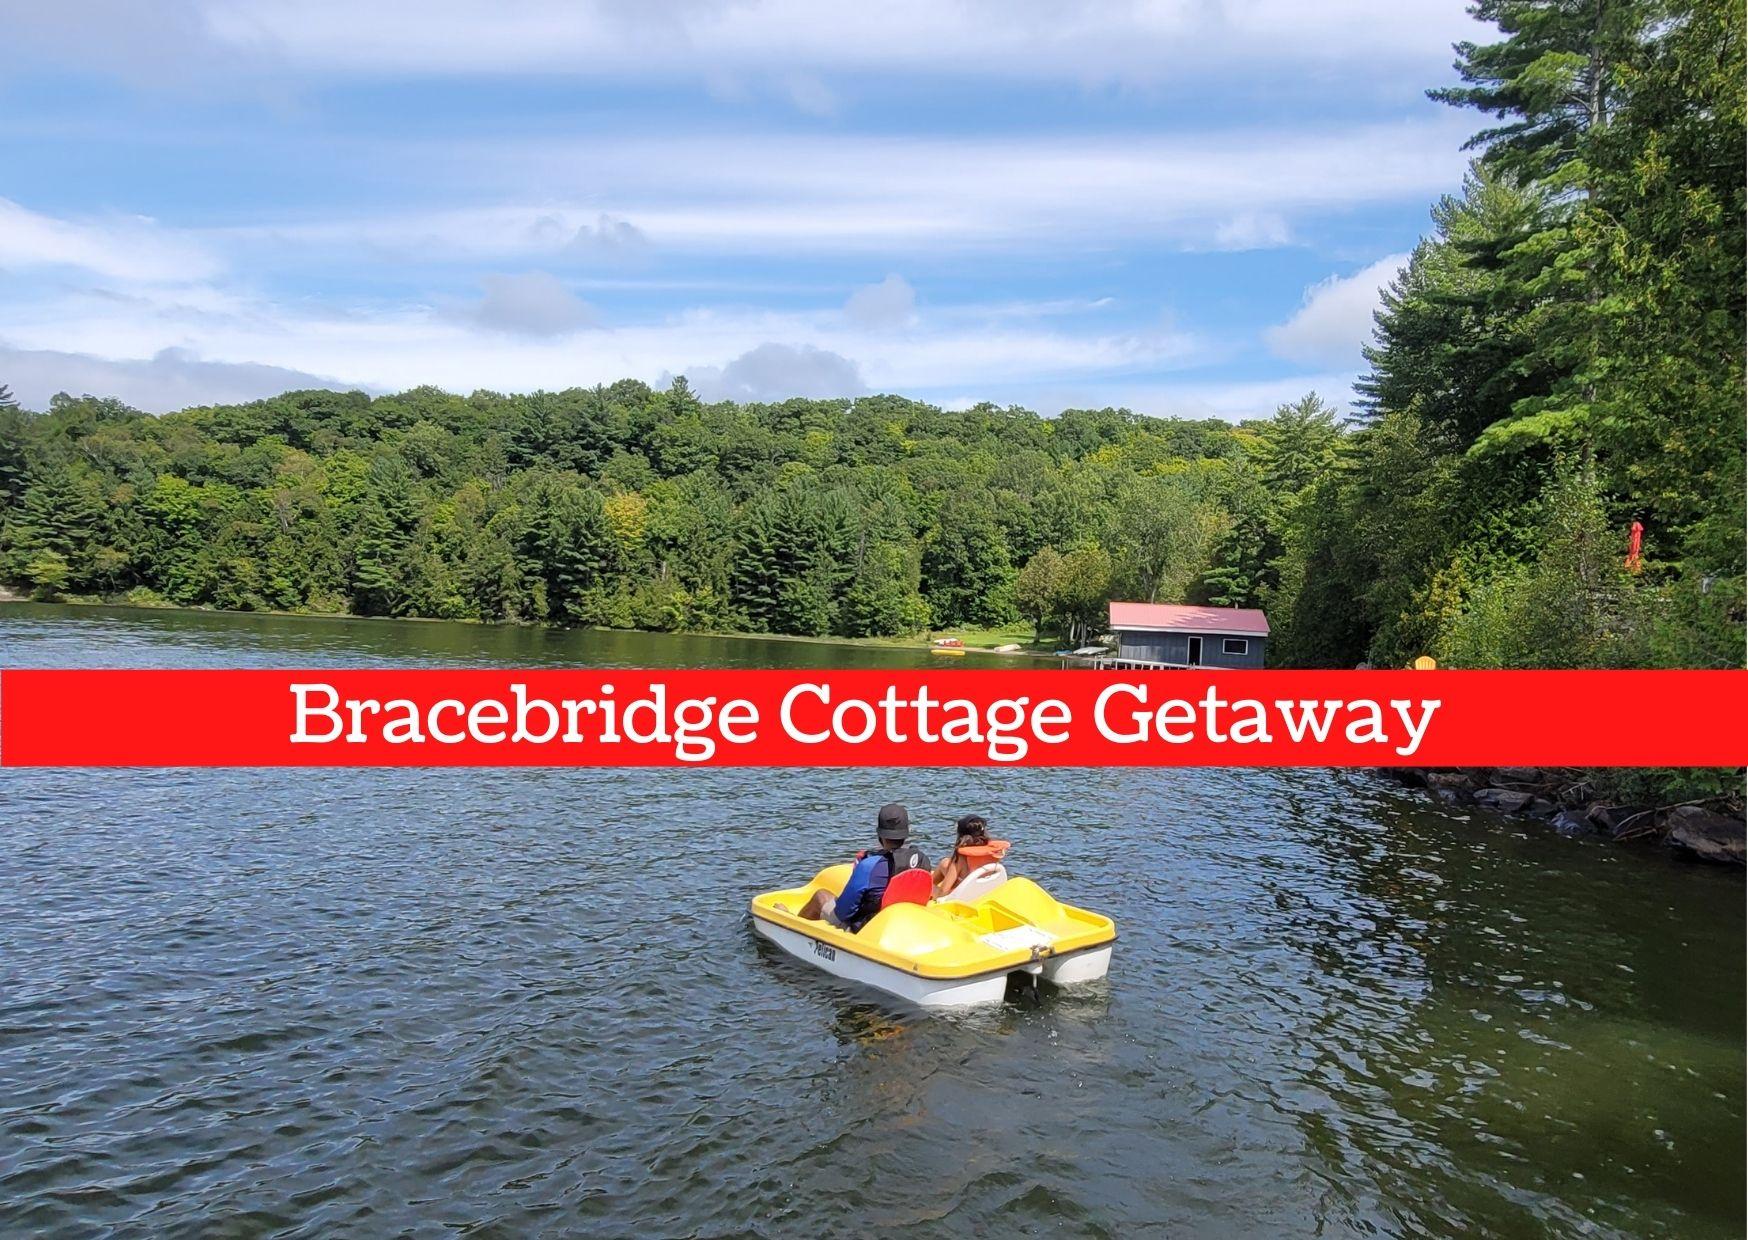 bracebridge cottage getaway